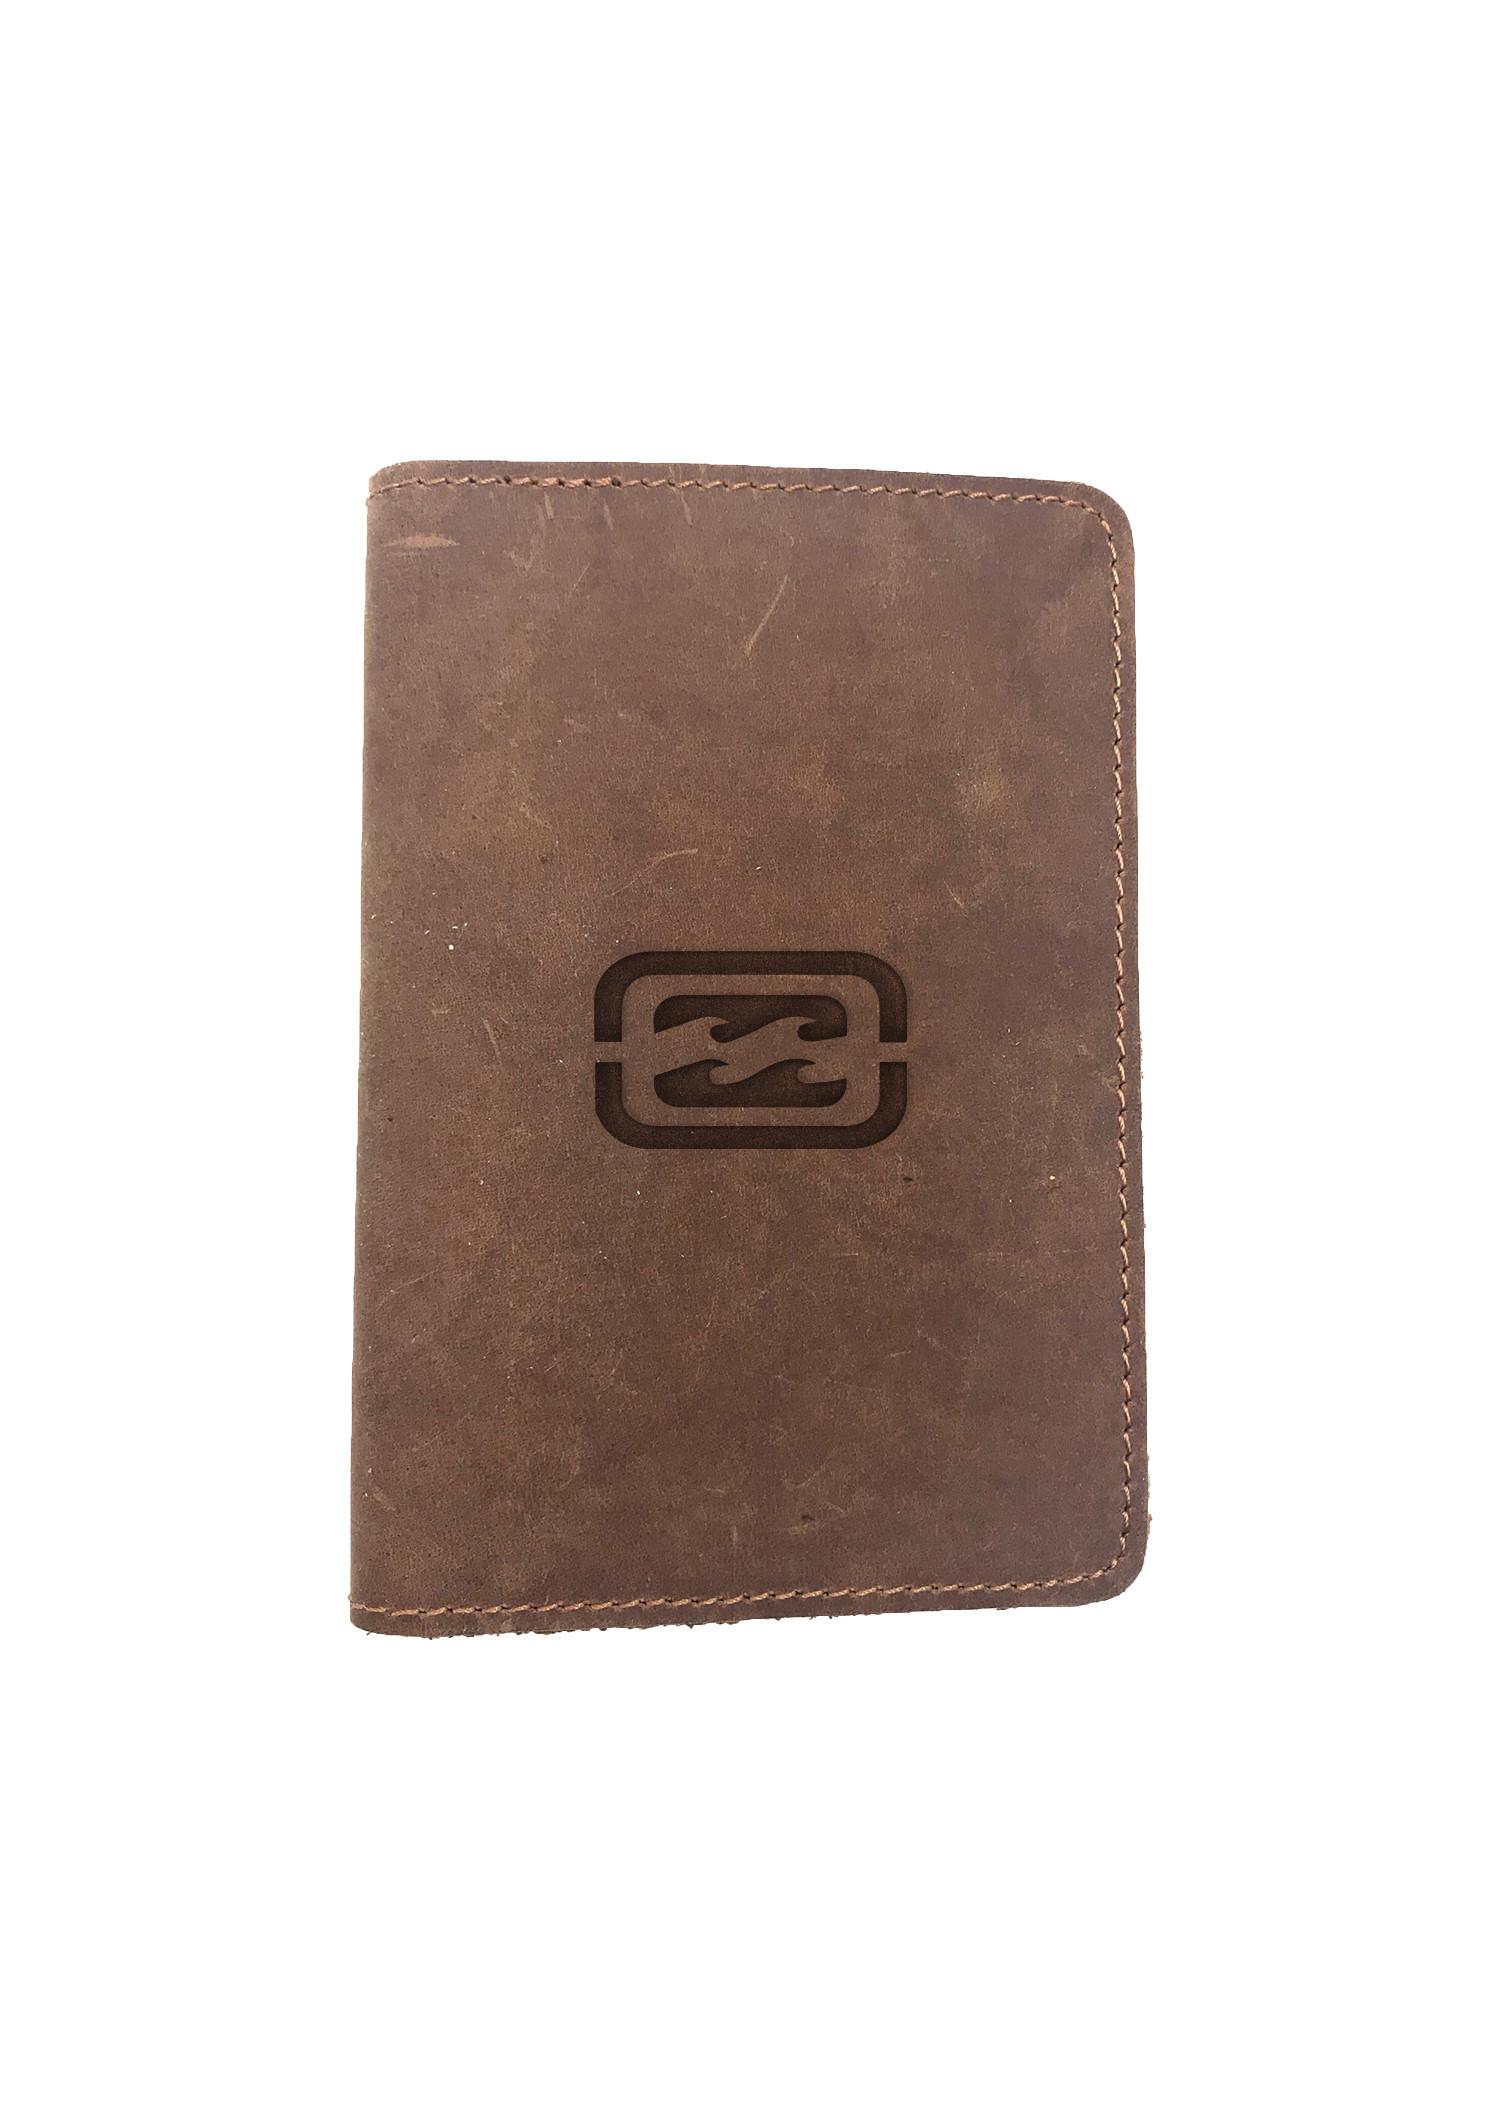 Passport Cover Bao Da Hộ Chiếu Da Sáp Khắc Hình Hình BILLABOING (BROWN)